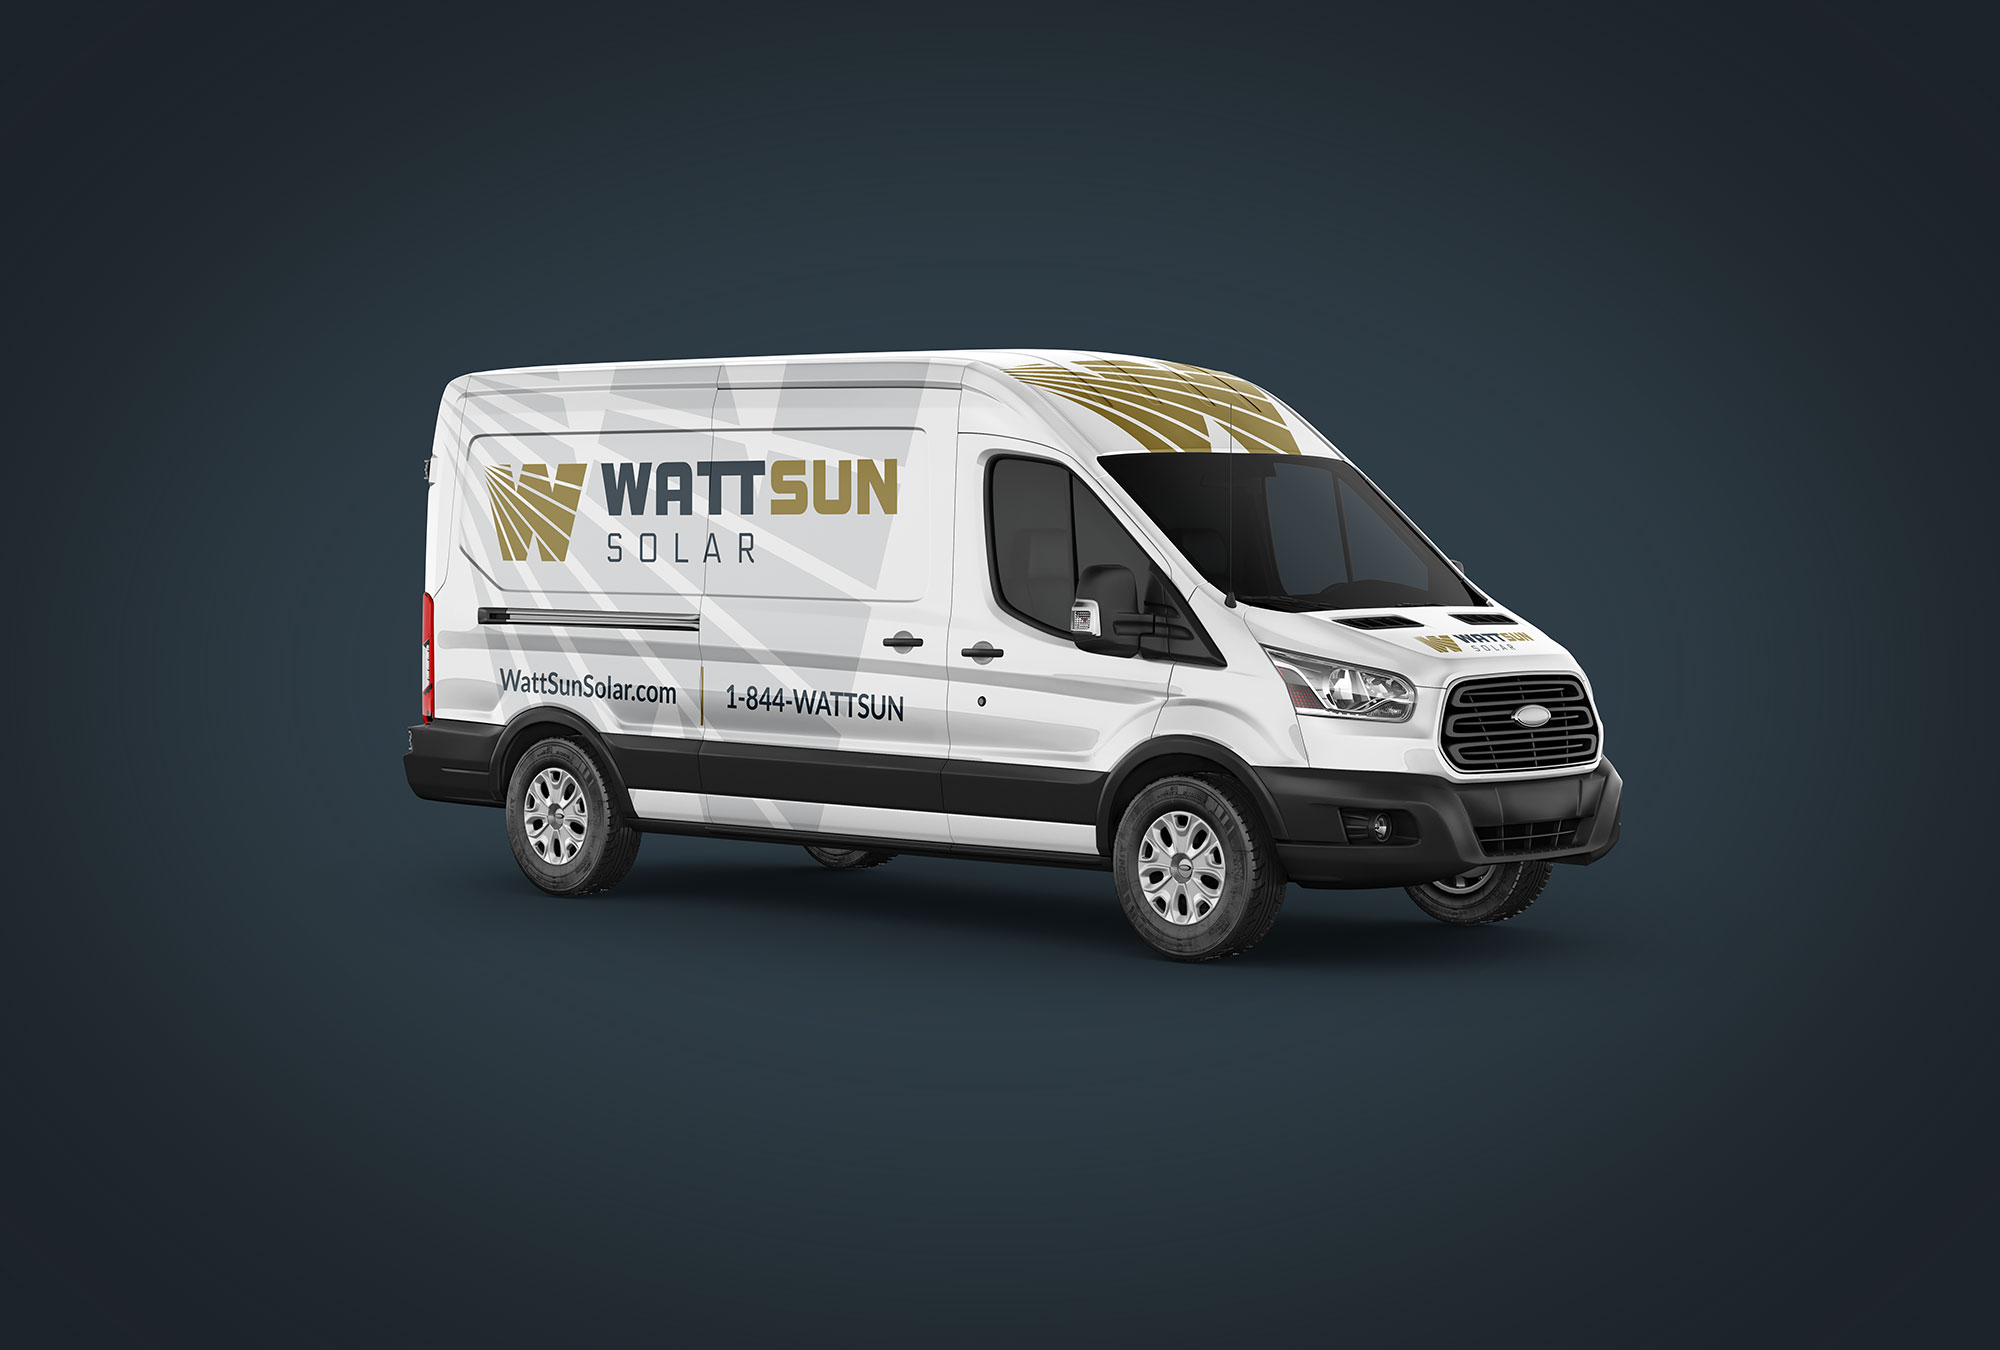 WattSun brand van wrap